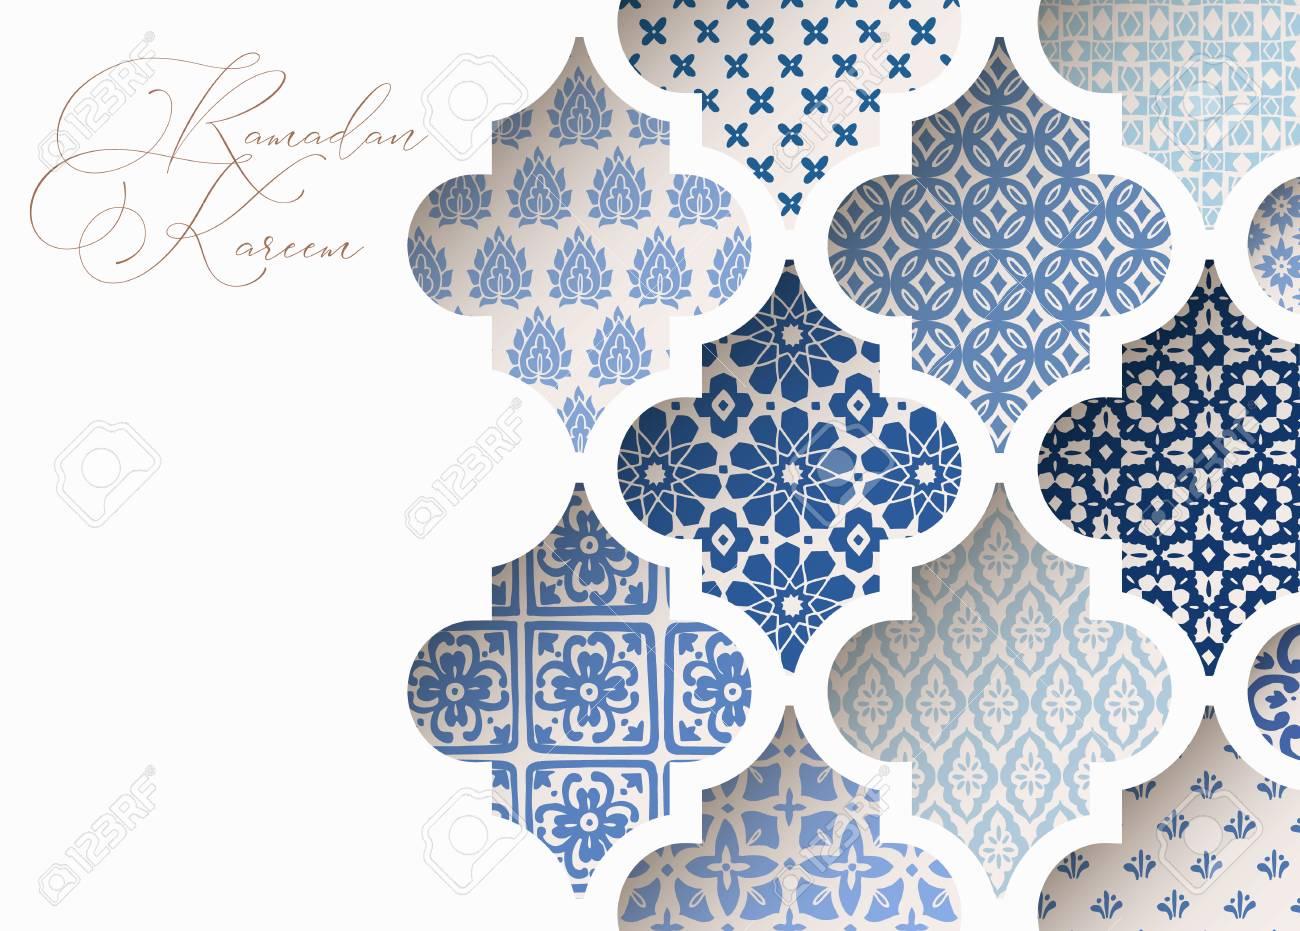 Close-up of blue ornamental arabic tiles, patterns through white mosque window. Greeting card, invitation for Muslim holiday Ramadan Kareem. Vector illustration bacground, web banner, modern design. - 119805633